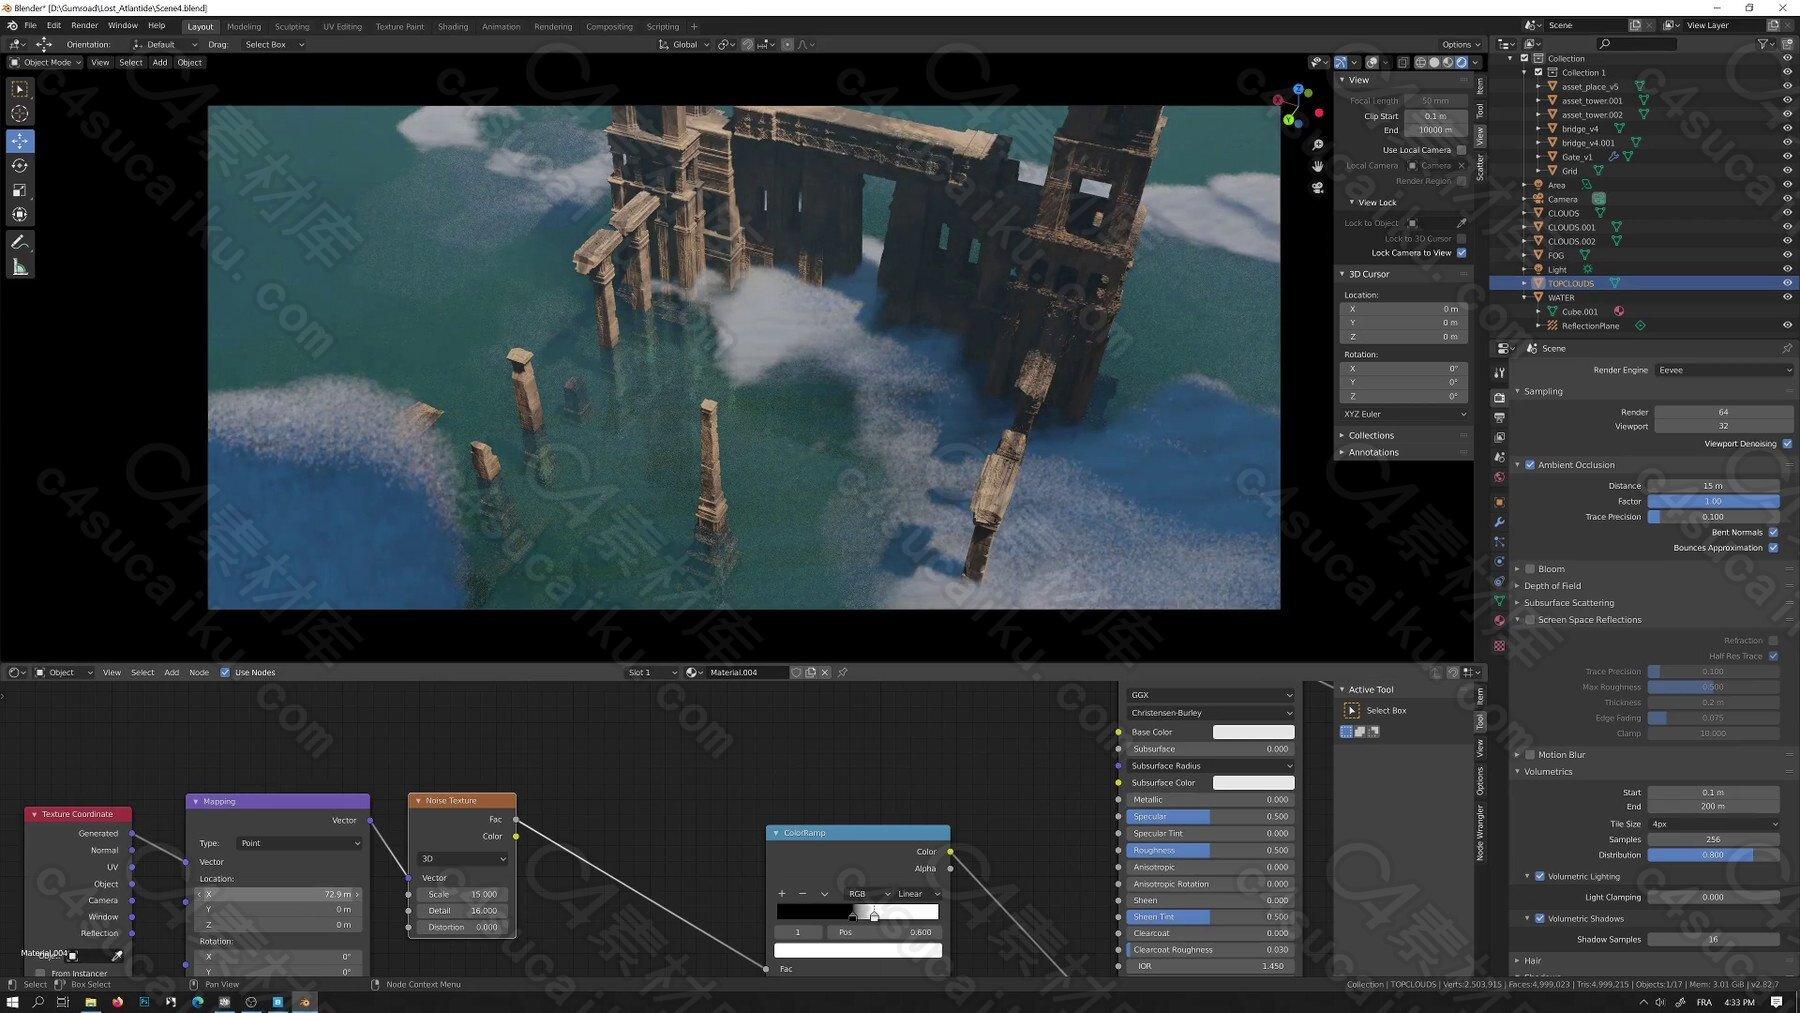 C4素材网-Blender教程-海上城市废墟遗迹场景